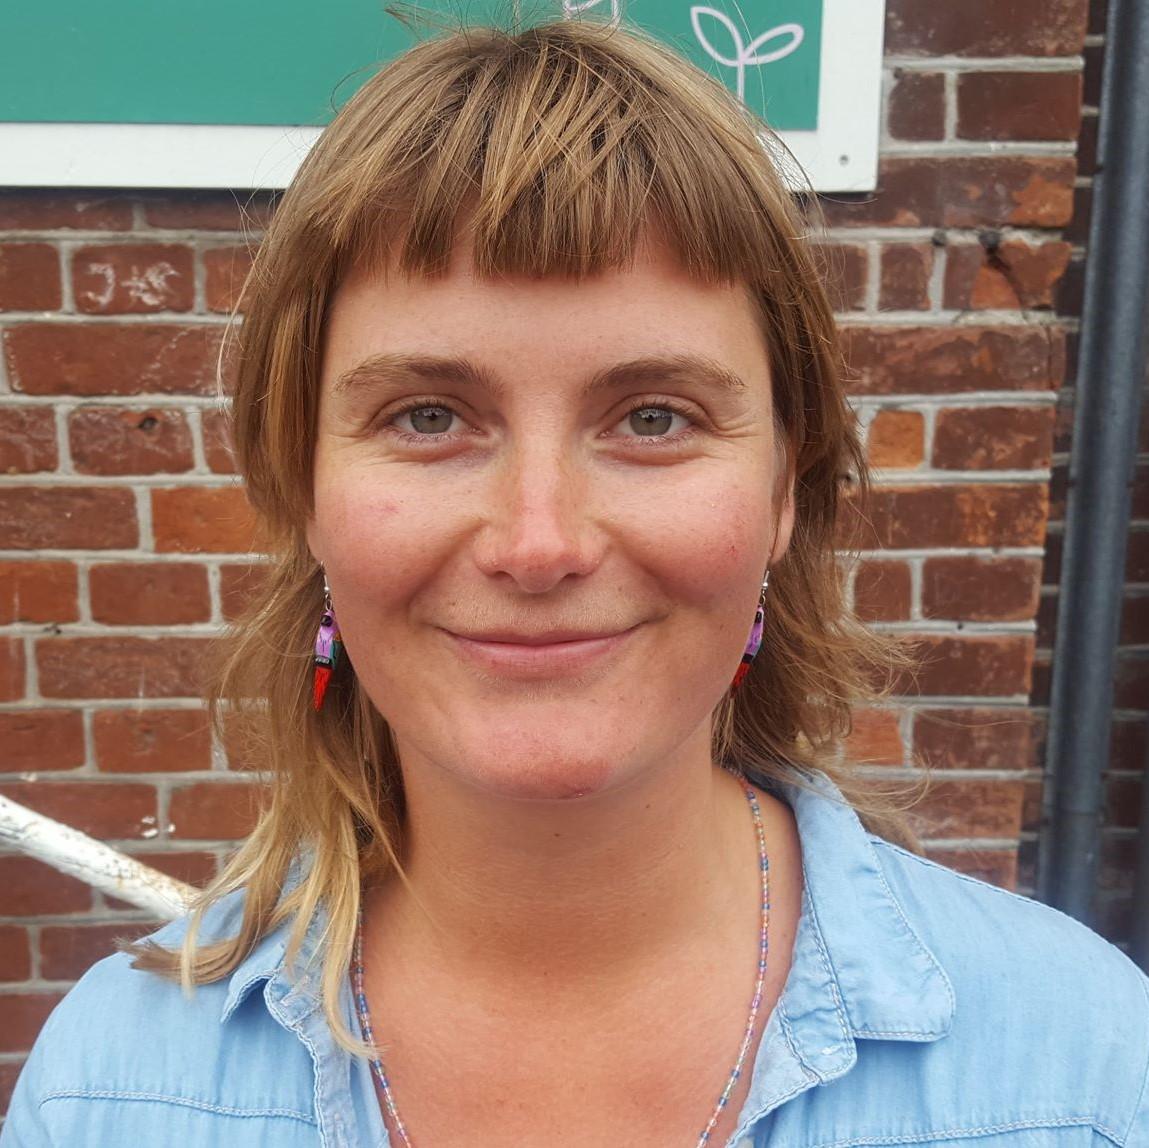 Sofie Fredensborg Jørgensen